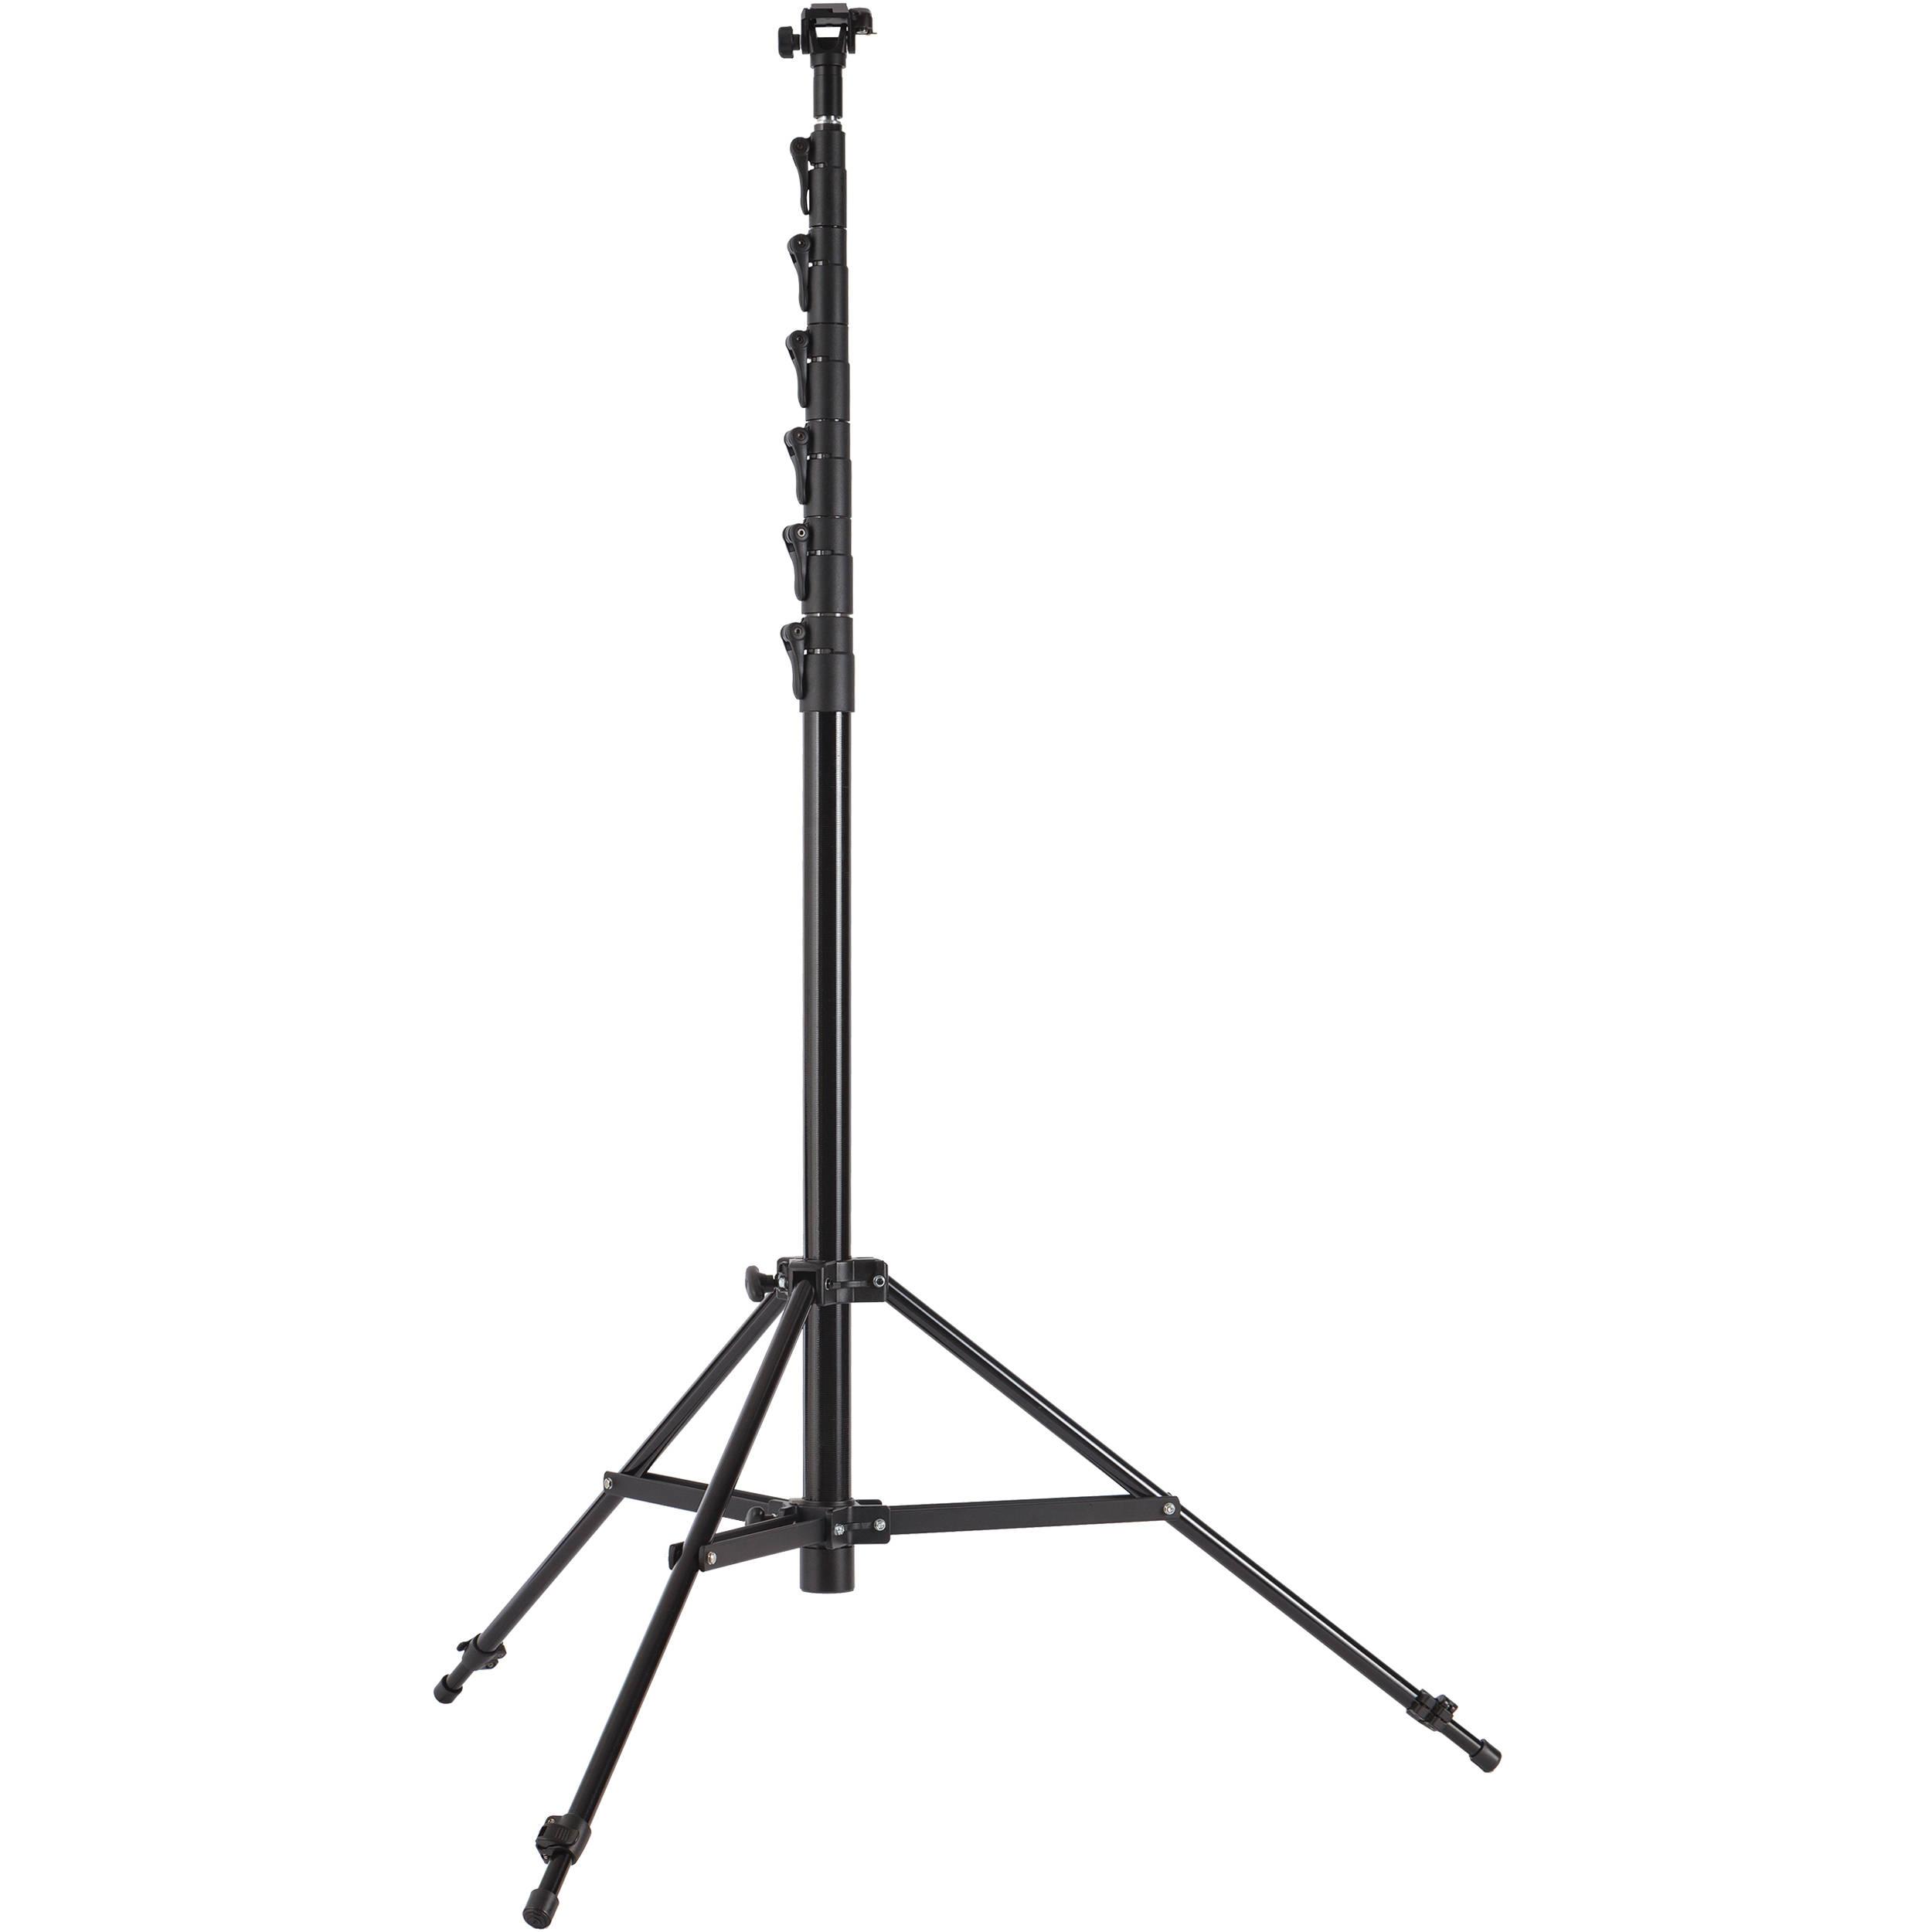 Studio Assets MegaMast Carbon Fiber Camera Stand (27.5') SA1240